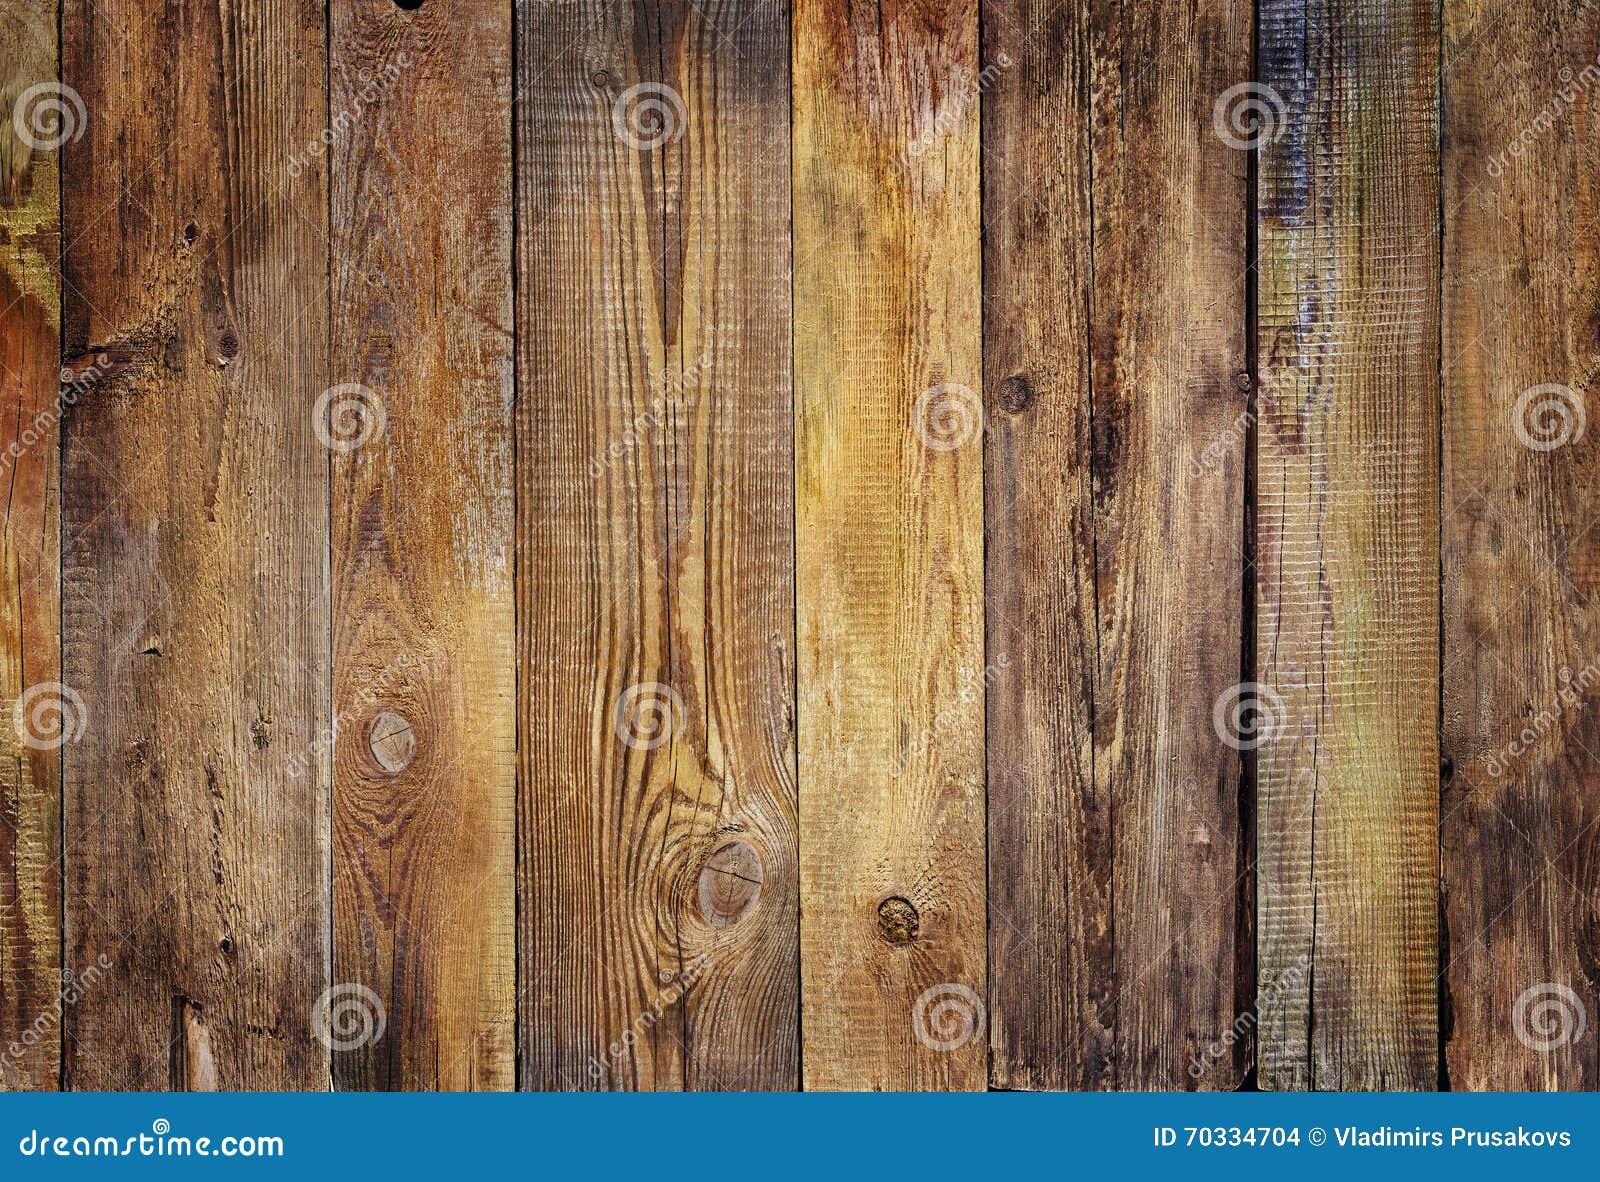 Wood texture plank grain background, wooden desk table or floor